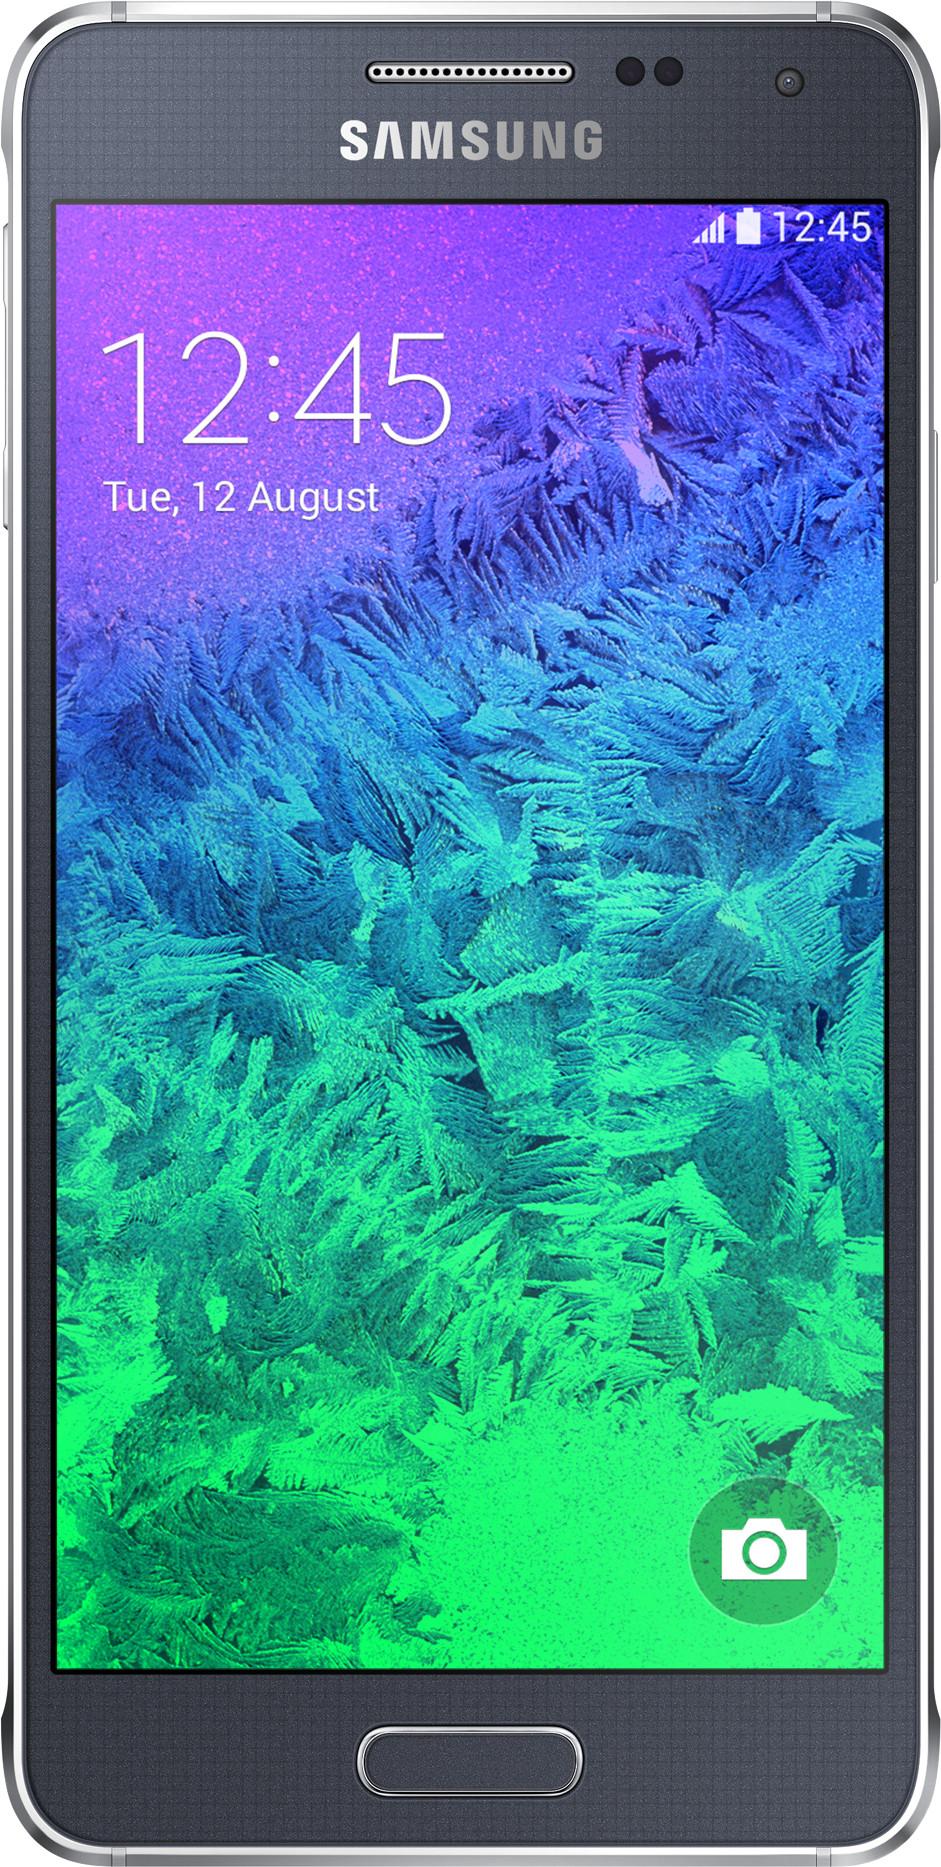 Samsung Galaxy Alpha Market Price Samsung Galaxy Alpha Price in